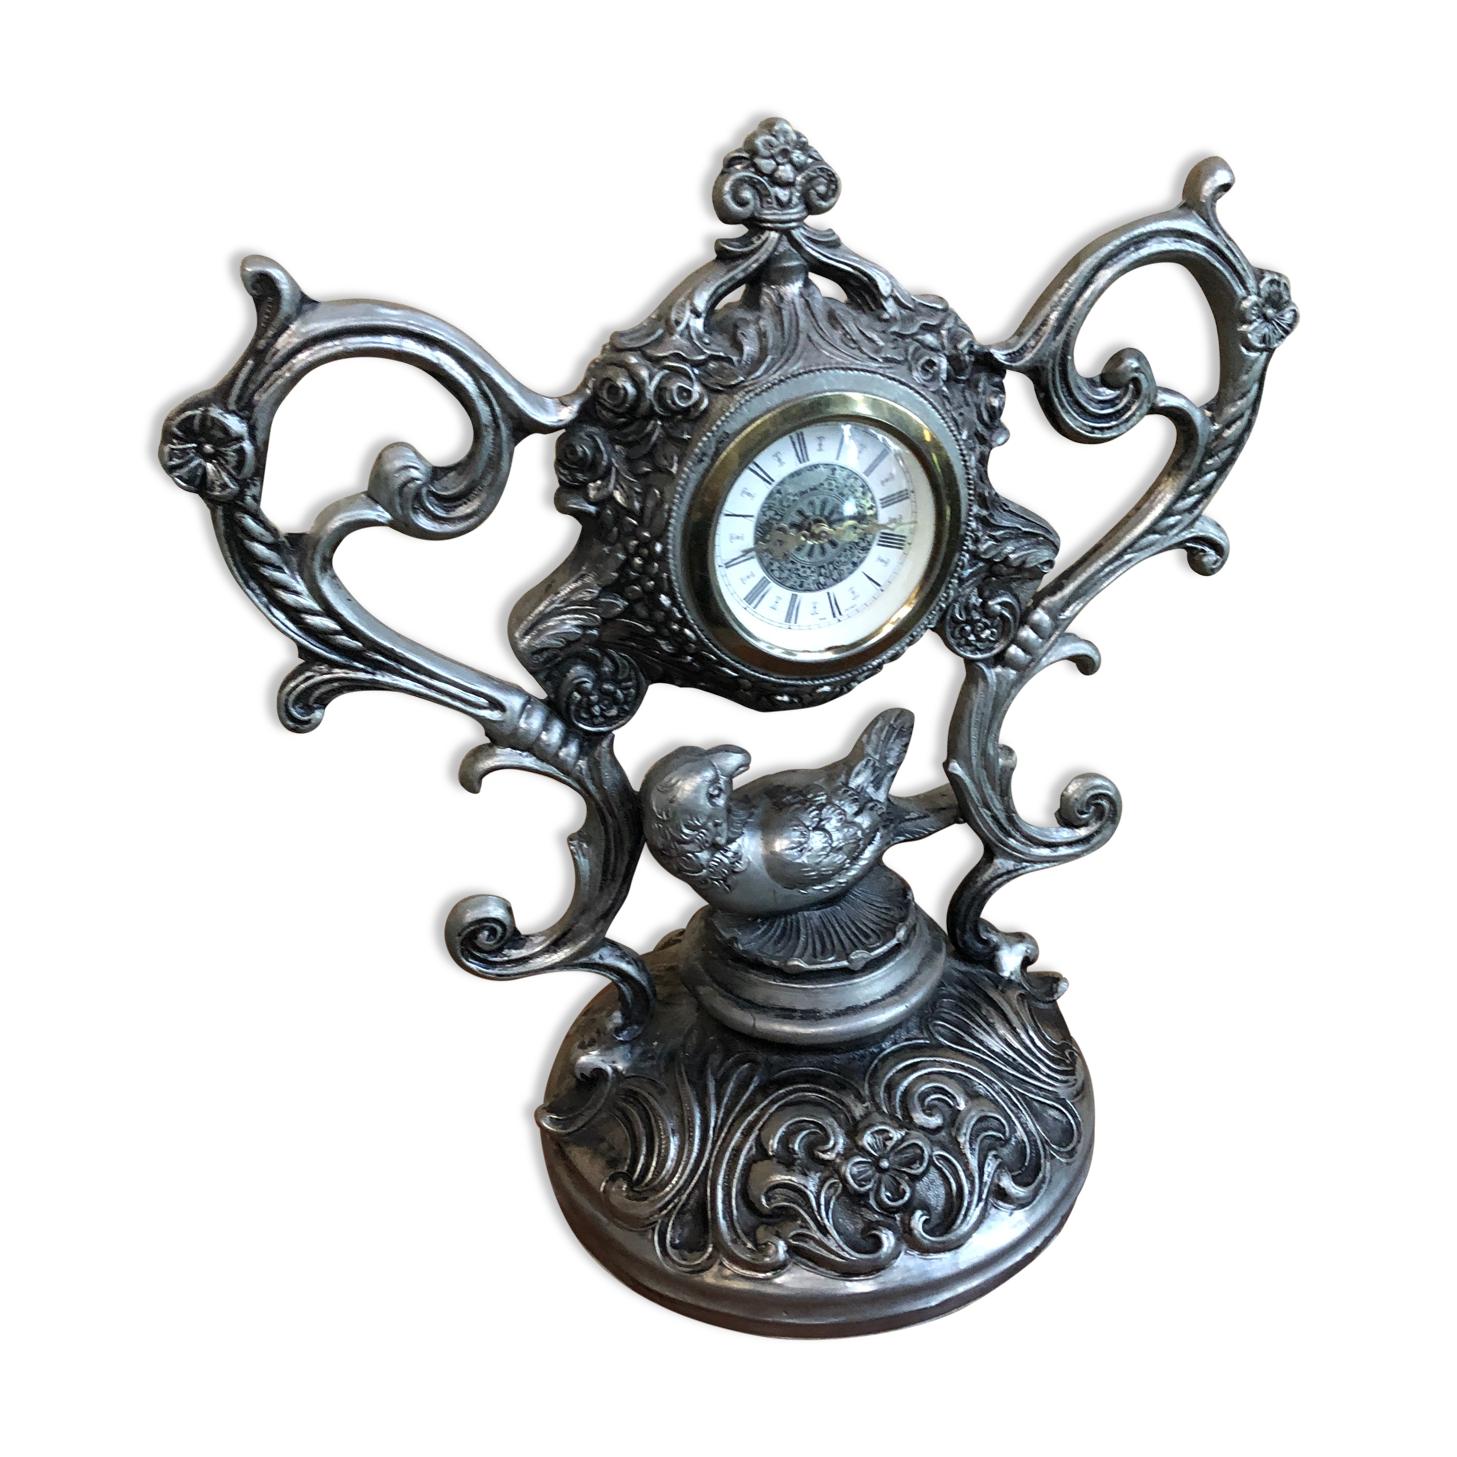 Ancienne horloge pendule de table style baroque métal gris made in italy vintage